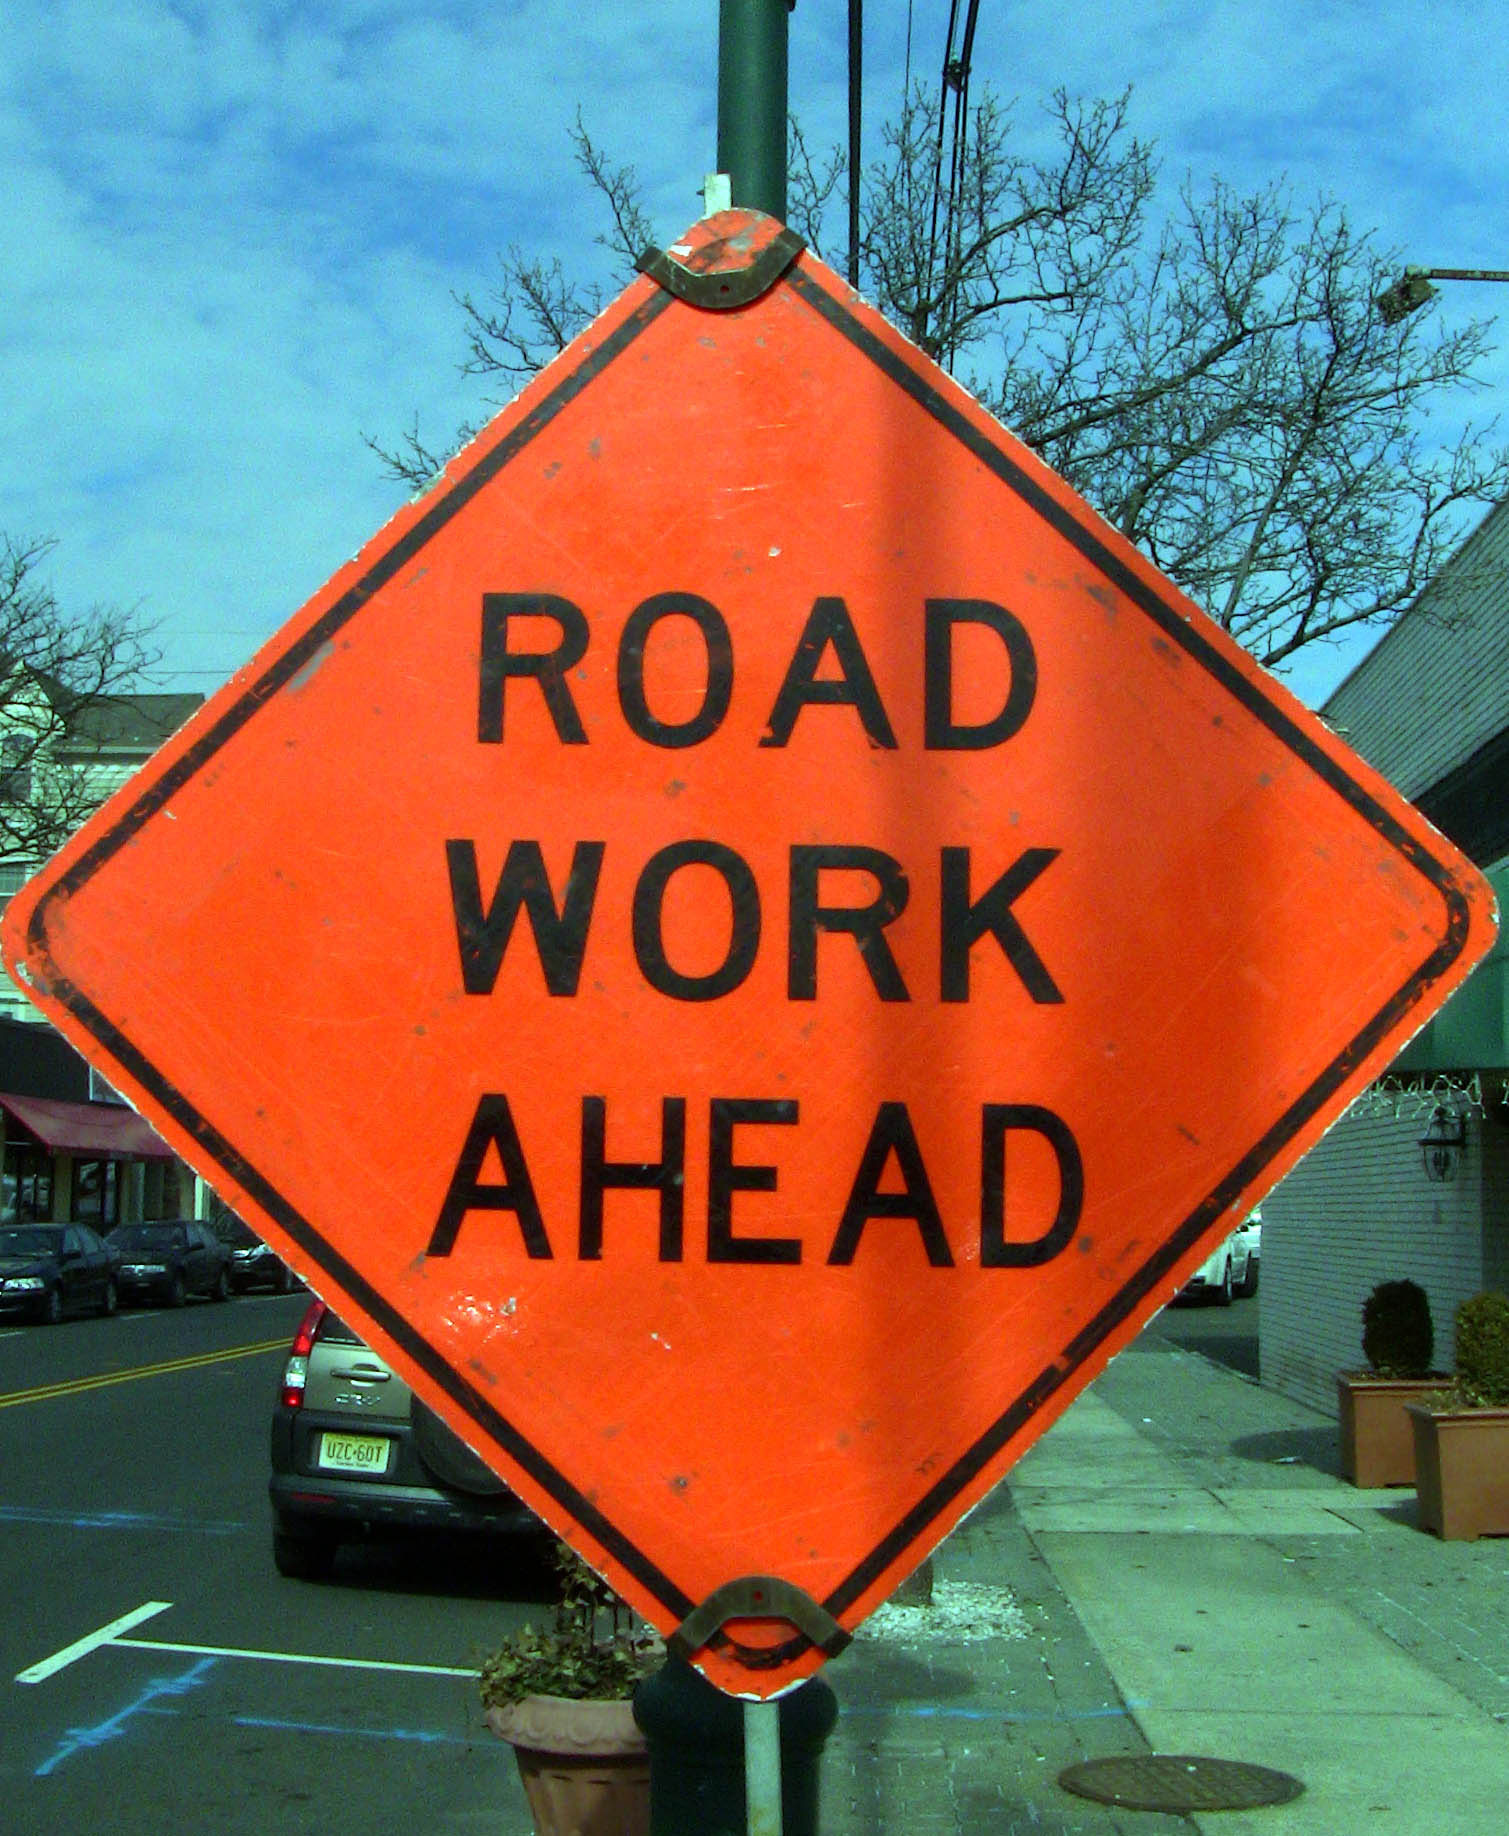 38fd0477aa2af548b3f6_Road_Work_Ahead_sign.jpg